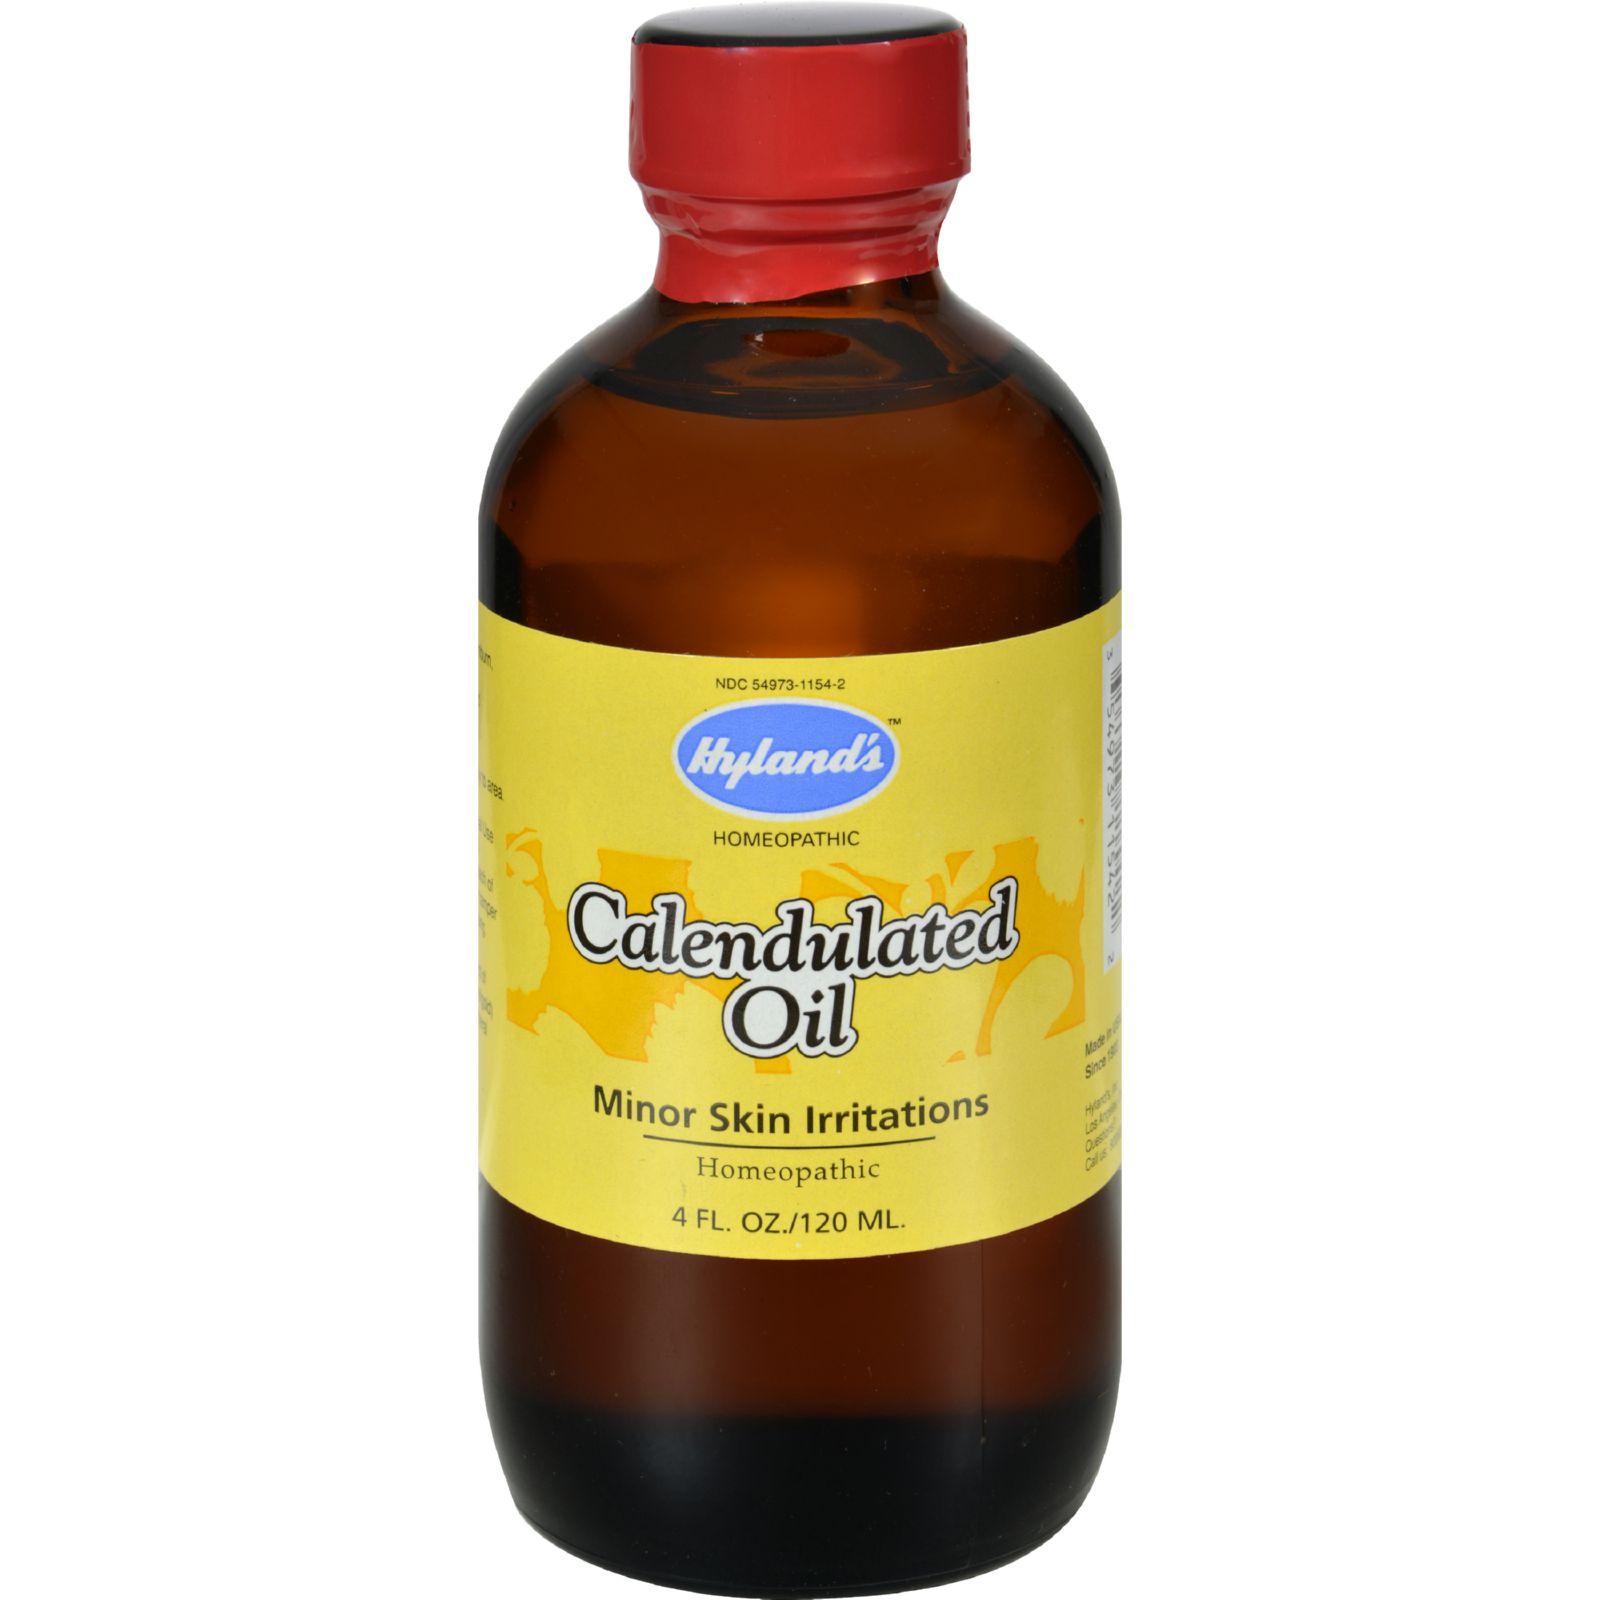 Hylands Homeopathic Calendula Oil - 4 Fl Oz